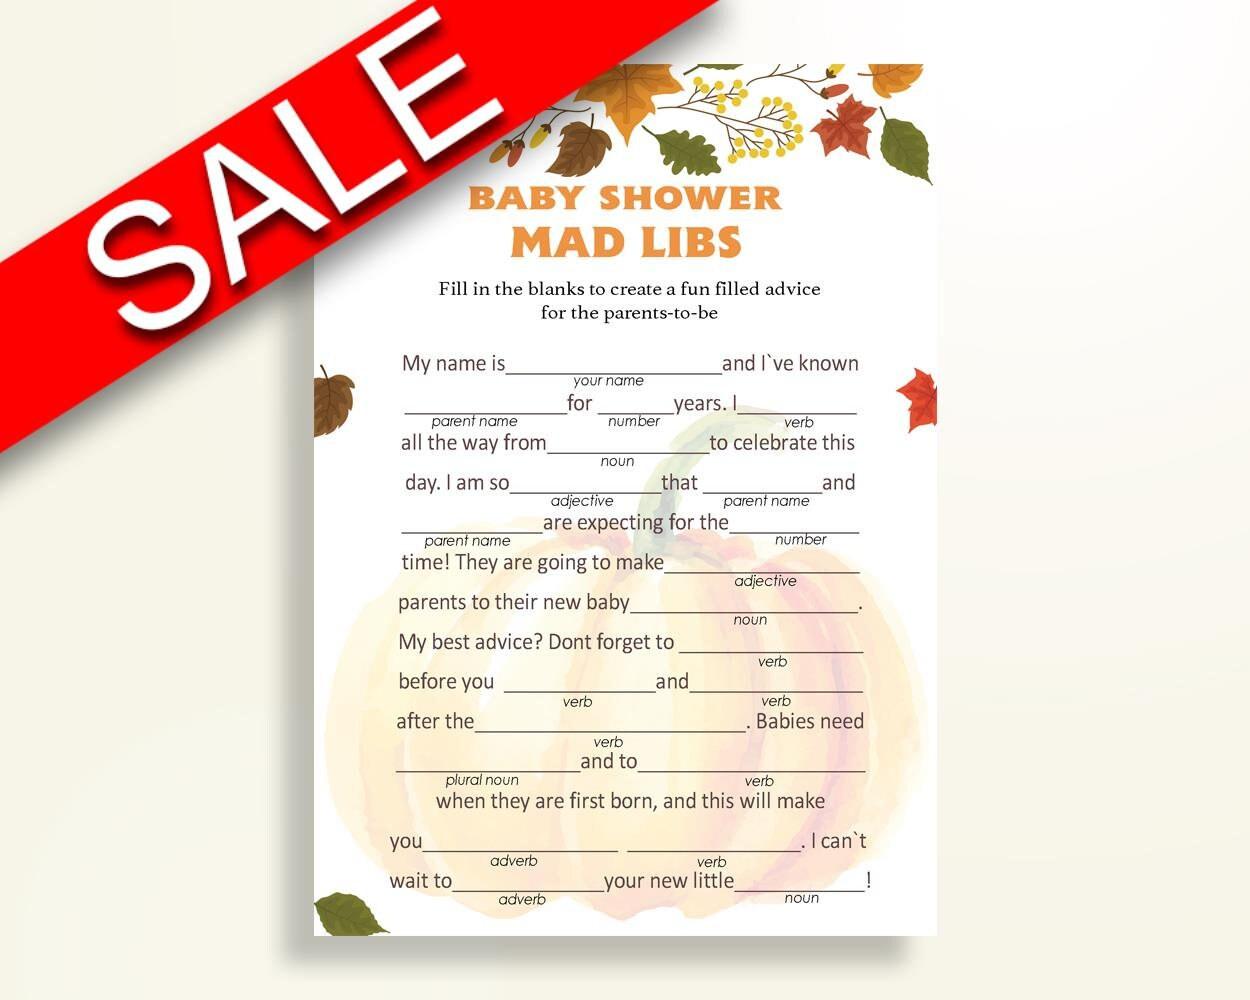 Mad Libs Baby Shower Mad Libs Autumn Baby Shower Mad Libs Baby Shower  Pumpkin Mad Libs Orange Brown prints digital download OALDE